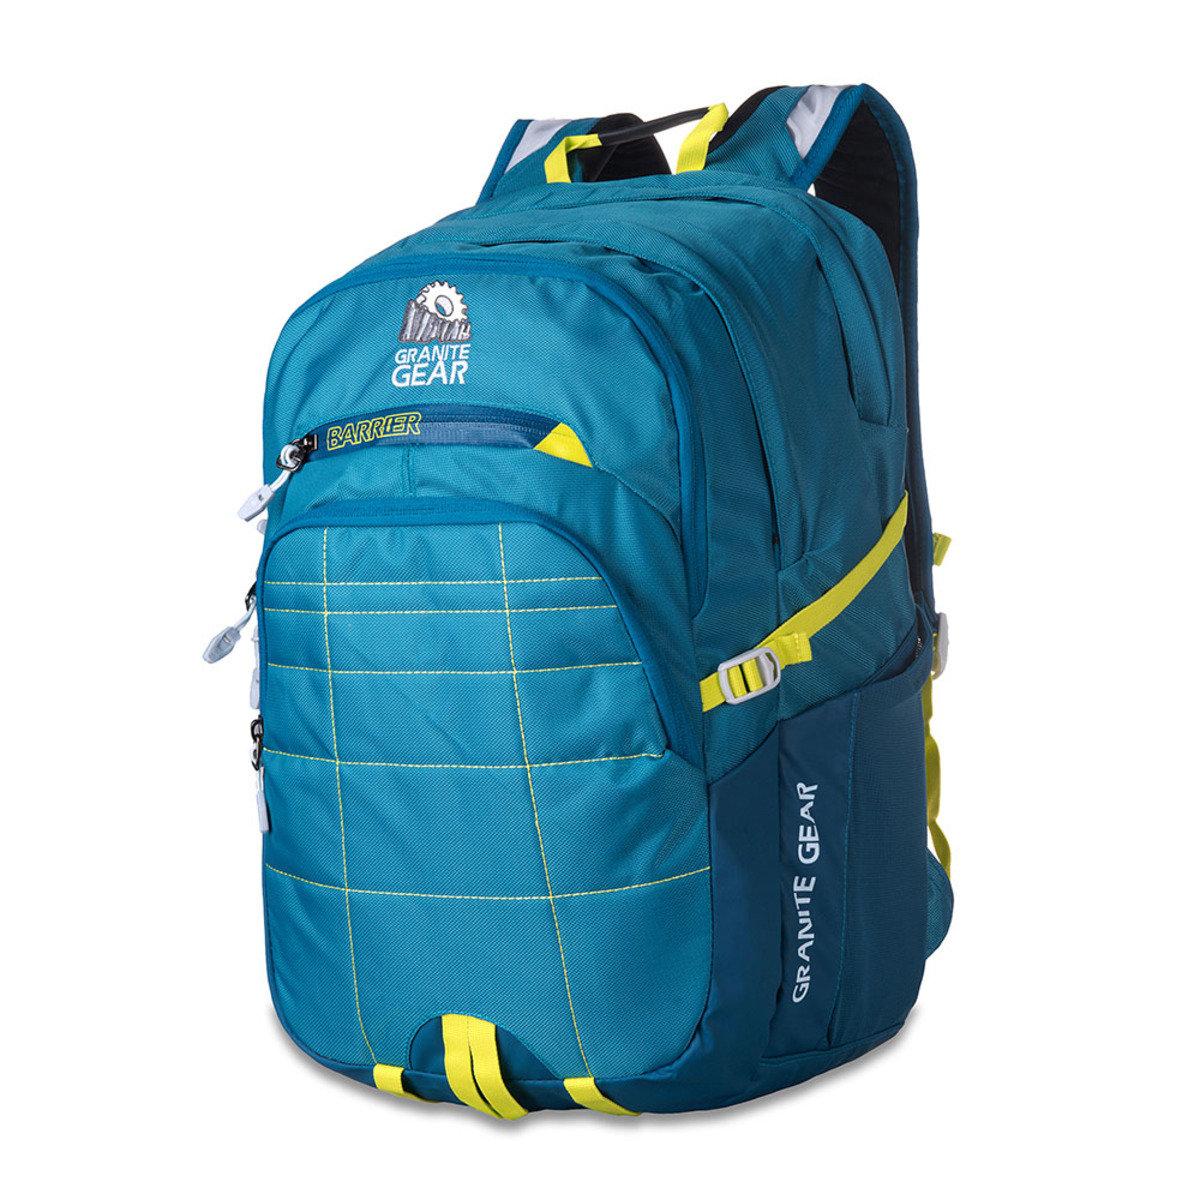 27dad7cedc70 Granite Gear   Buffalo 17 Laptop Backpack   HKTVmall Online Shopping